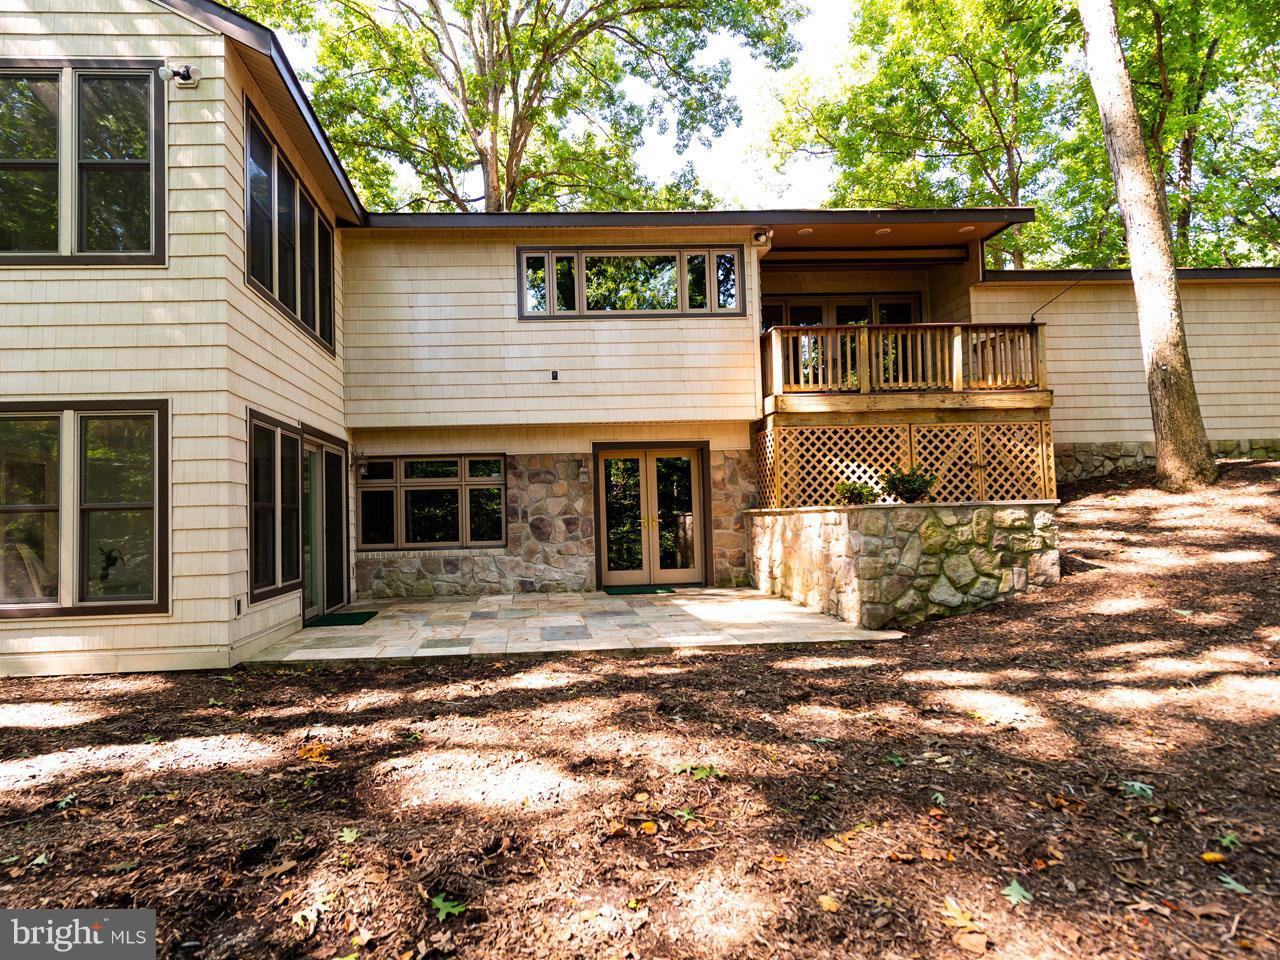 1002303700-300502418964-2021-07-22-03-27-23  |   | Alexandria Delaware Real Estate For Sale | MLS# 1002303700  - Best of Northern Virginia